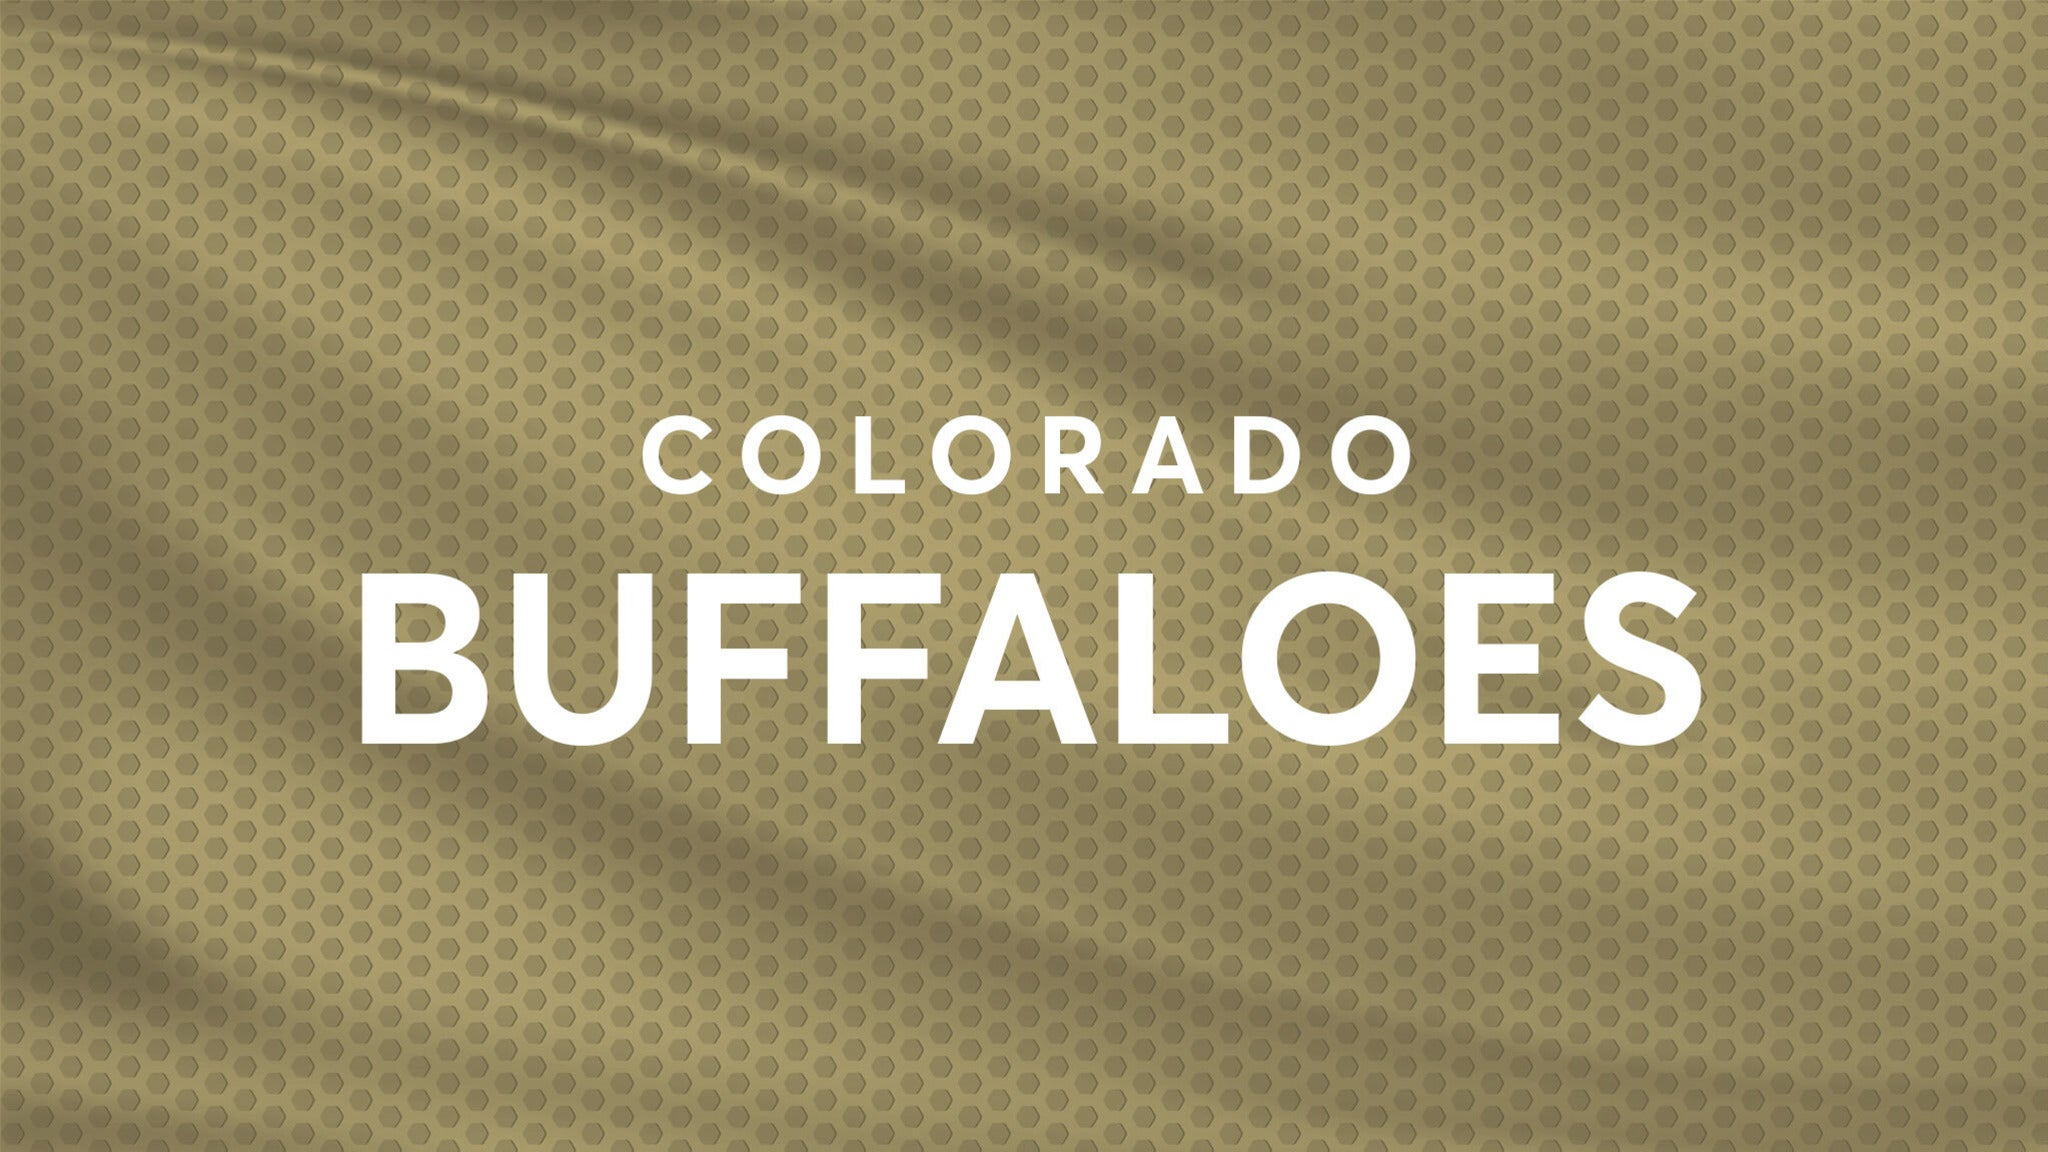 University of Colorado Buffaloes Womens Basketball